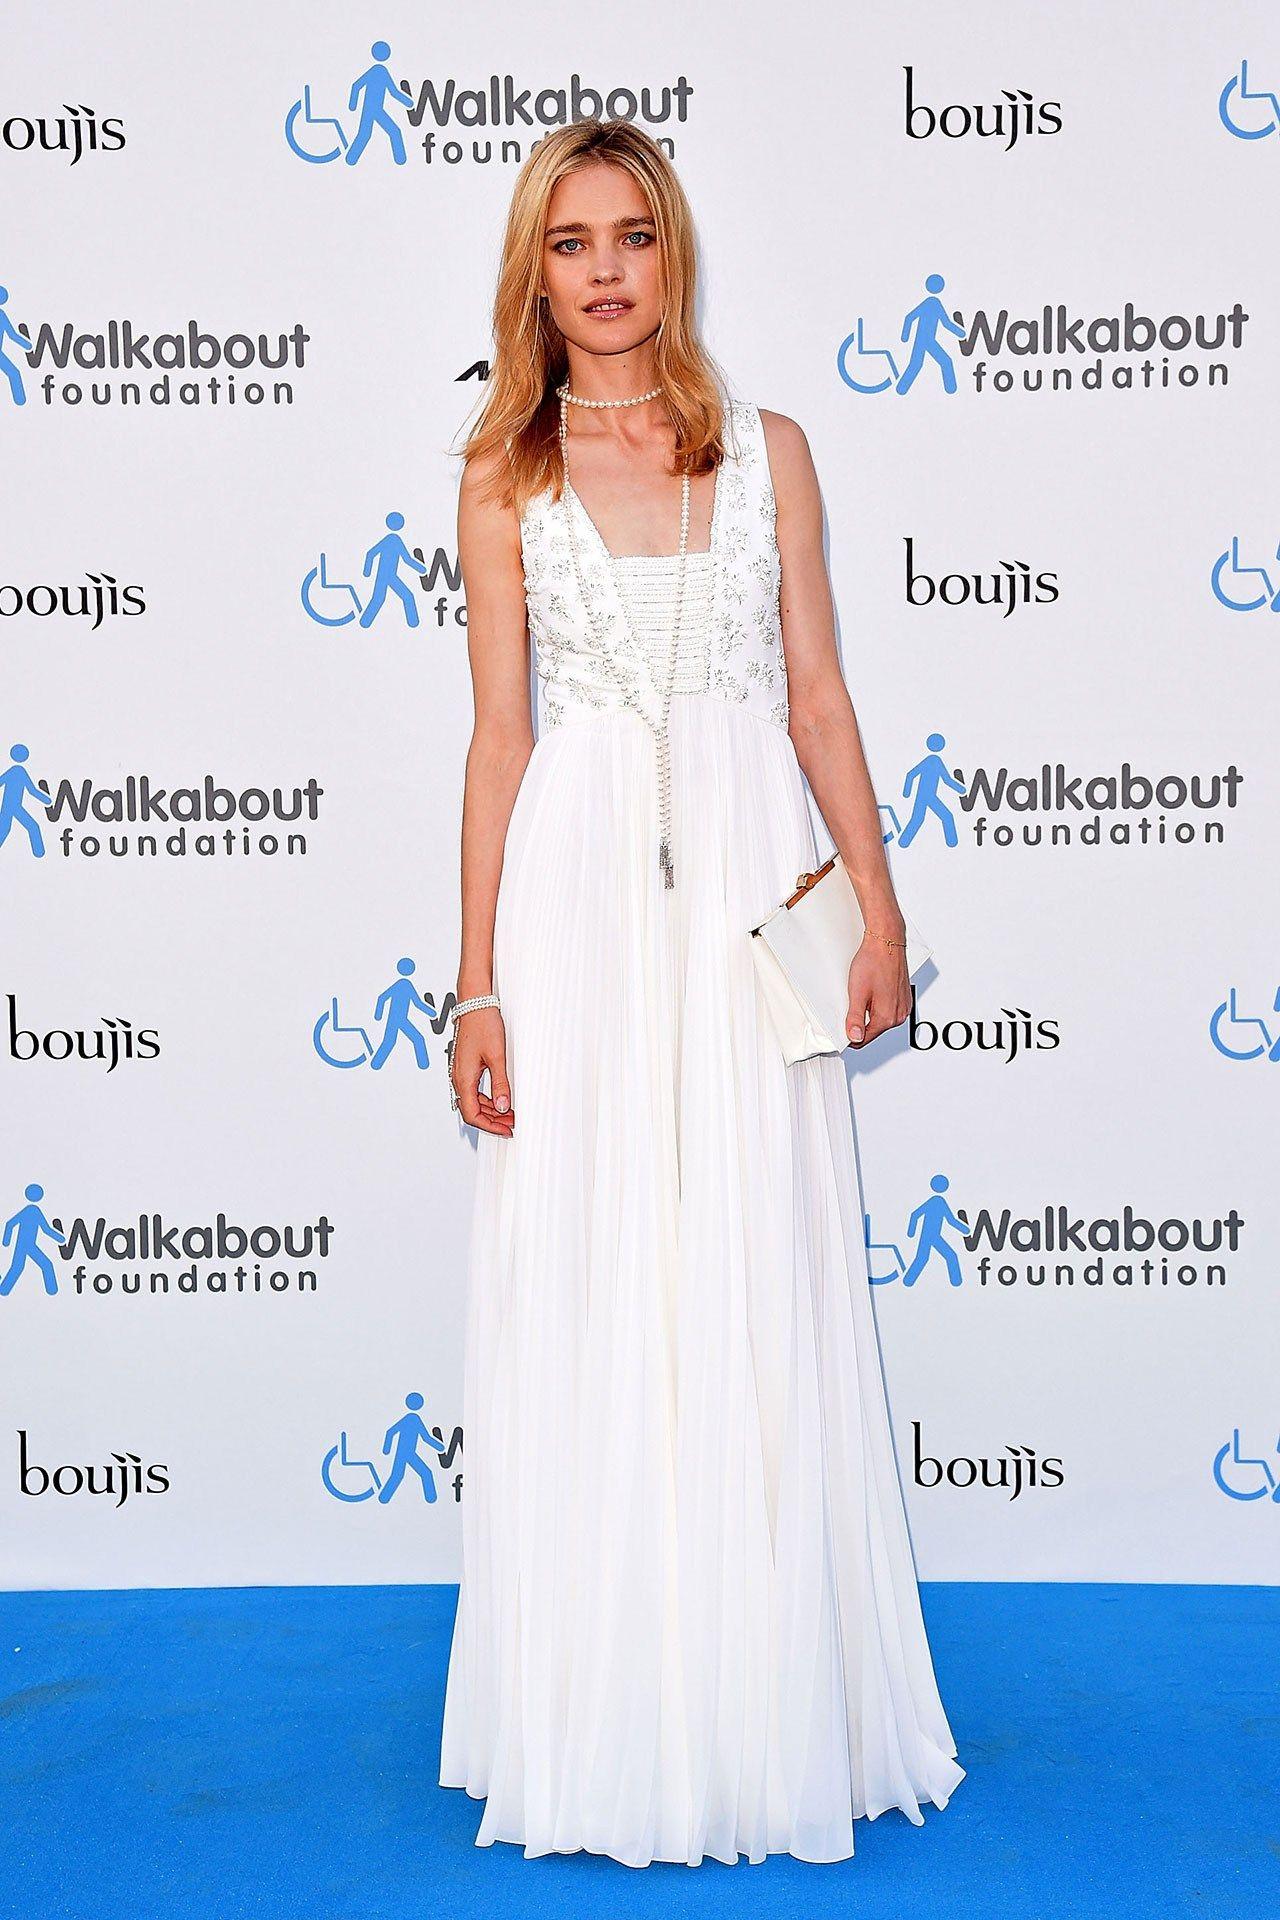 Natalia Vodianova - Walkabout Foundation Inaugural Gala, London - June 27 2015